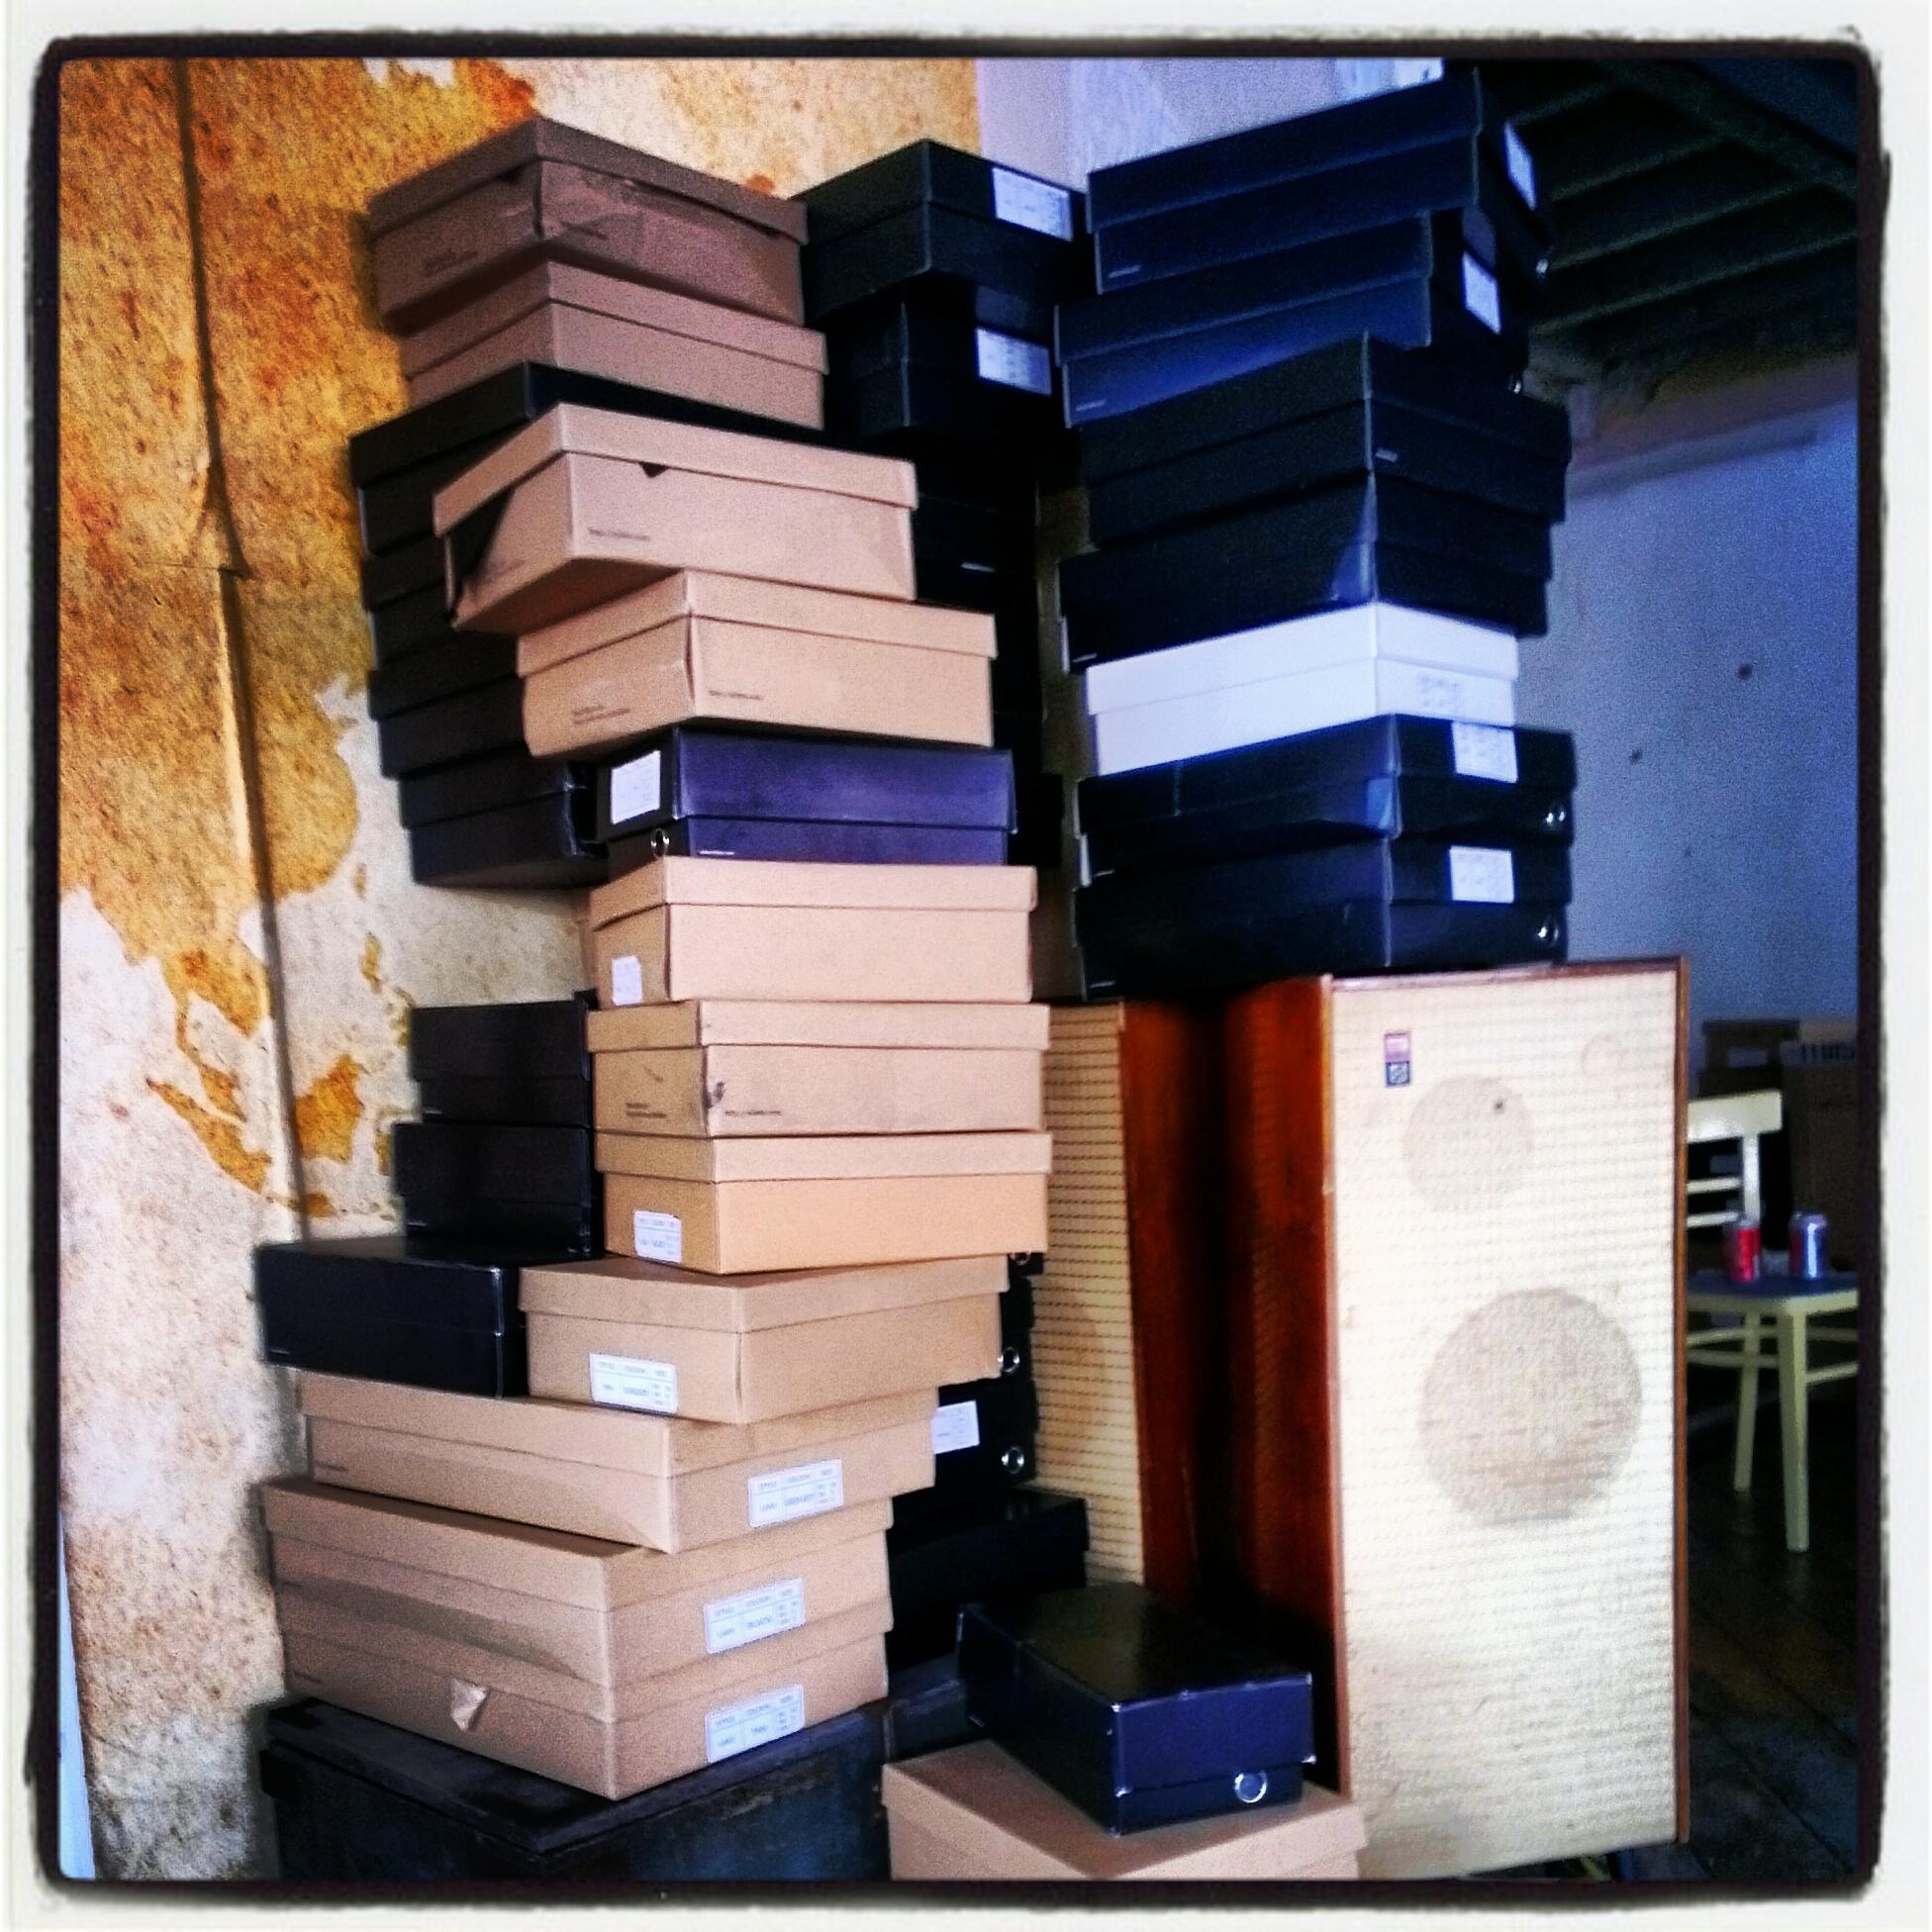 Miista shoe boxes